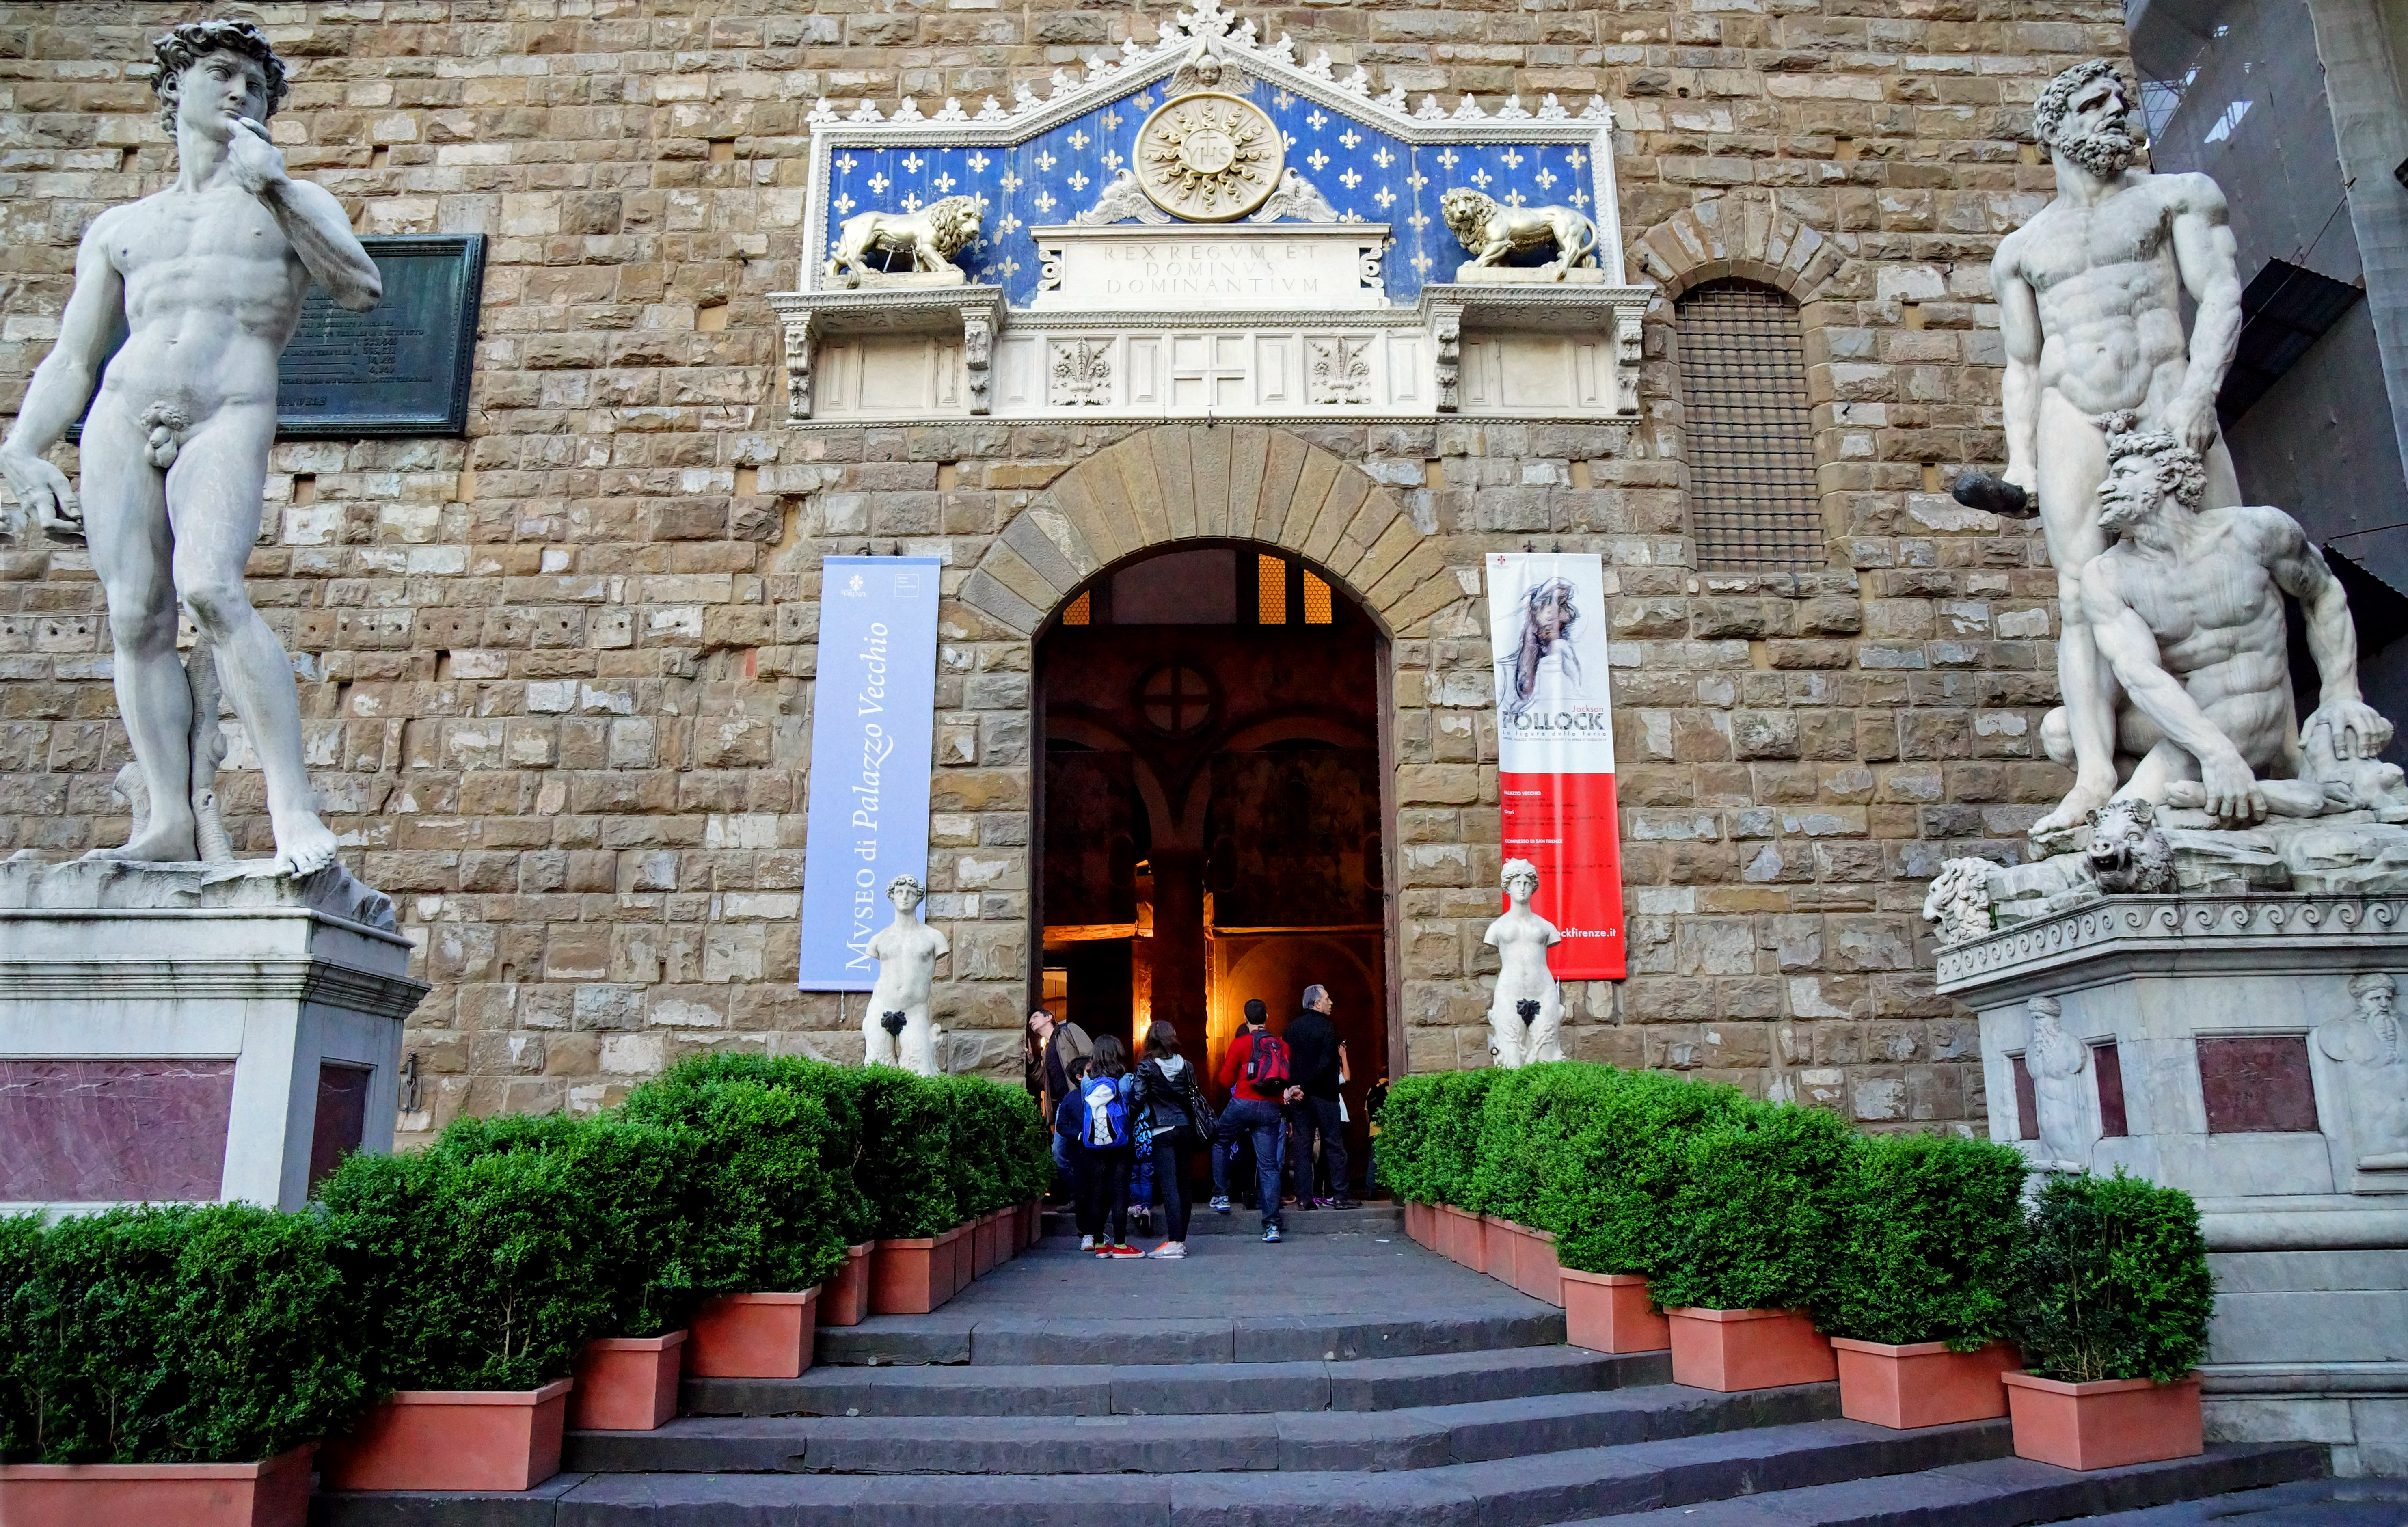 palazzo vecchio entrance - photo #18